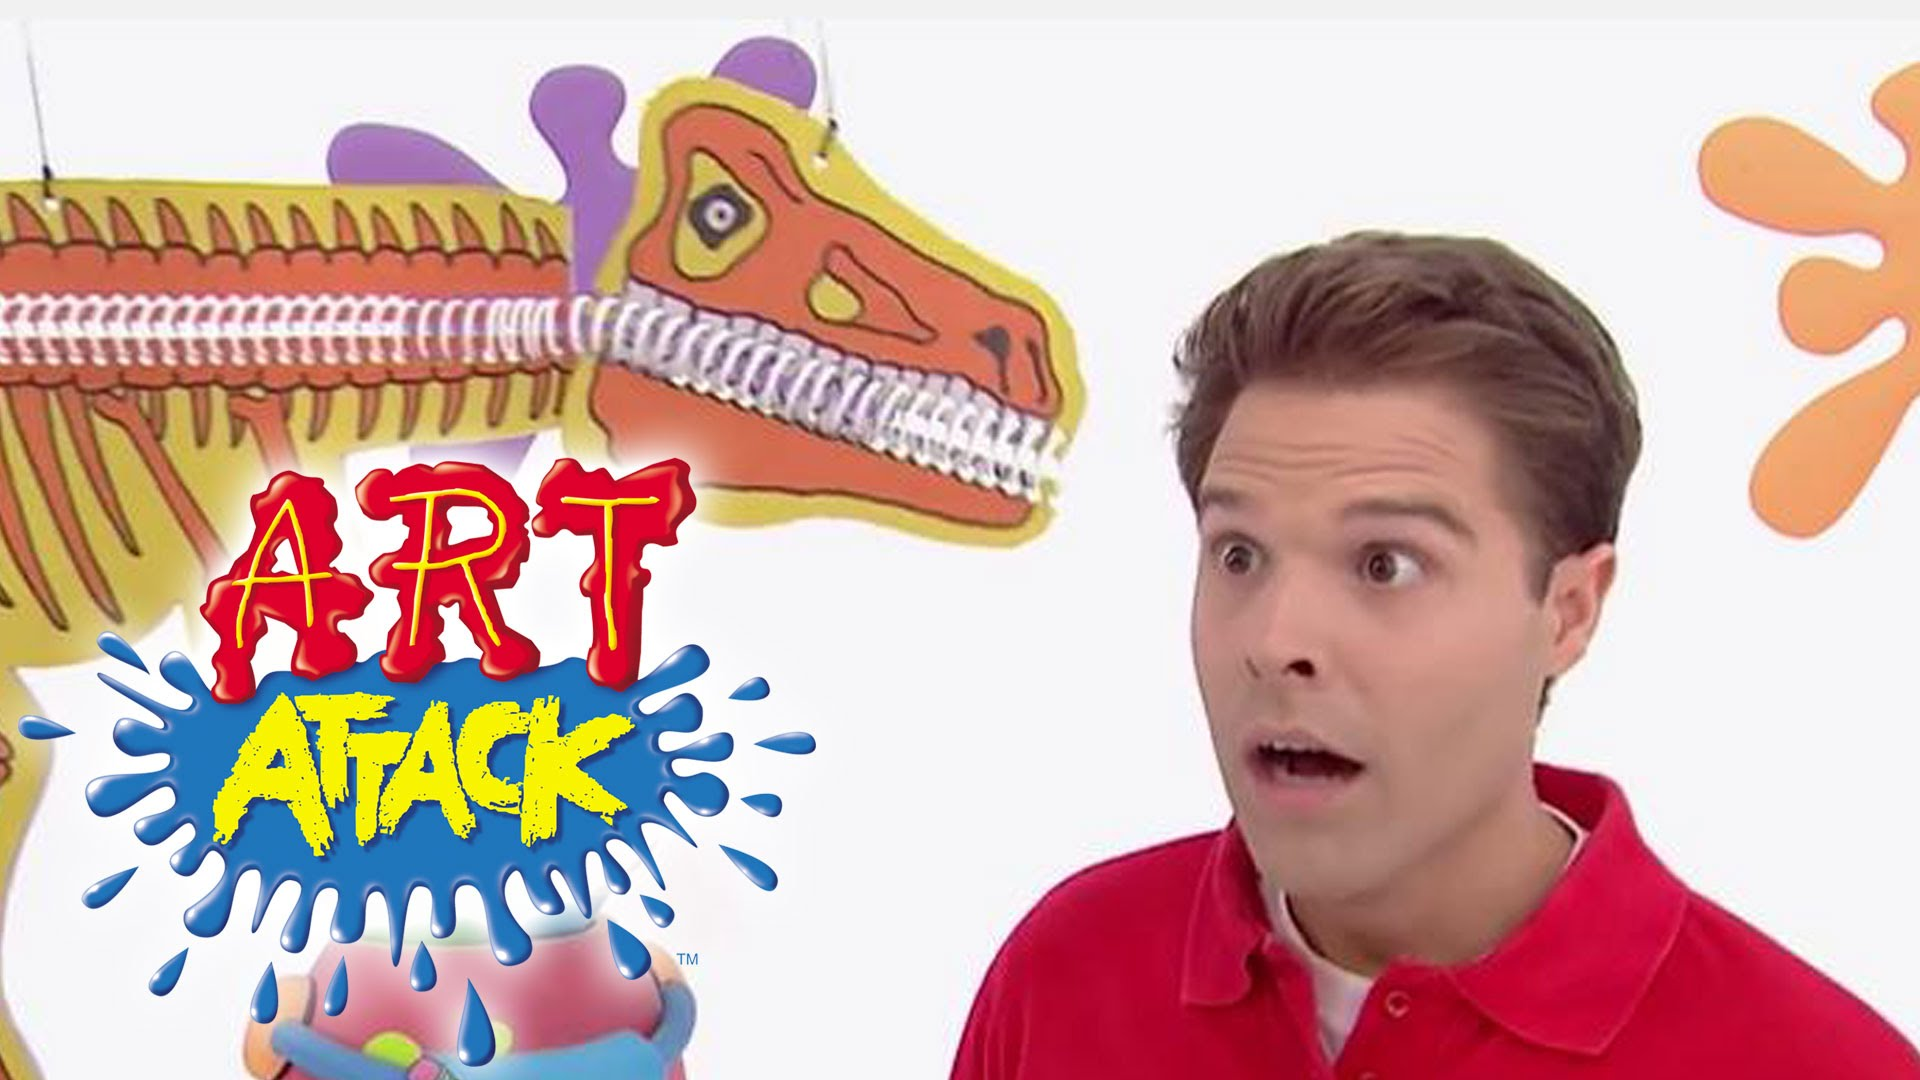 Watch Art Attack (India) Season 1 Episode 13 on Disney+